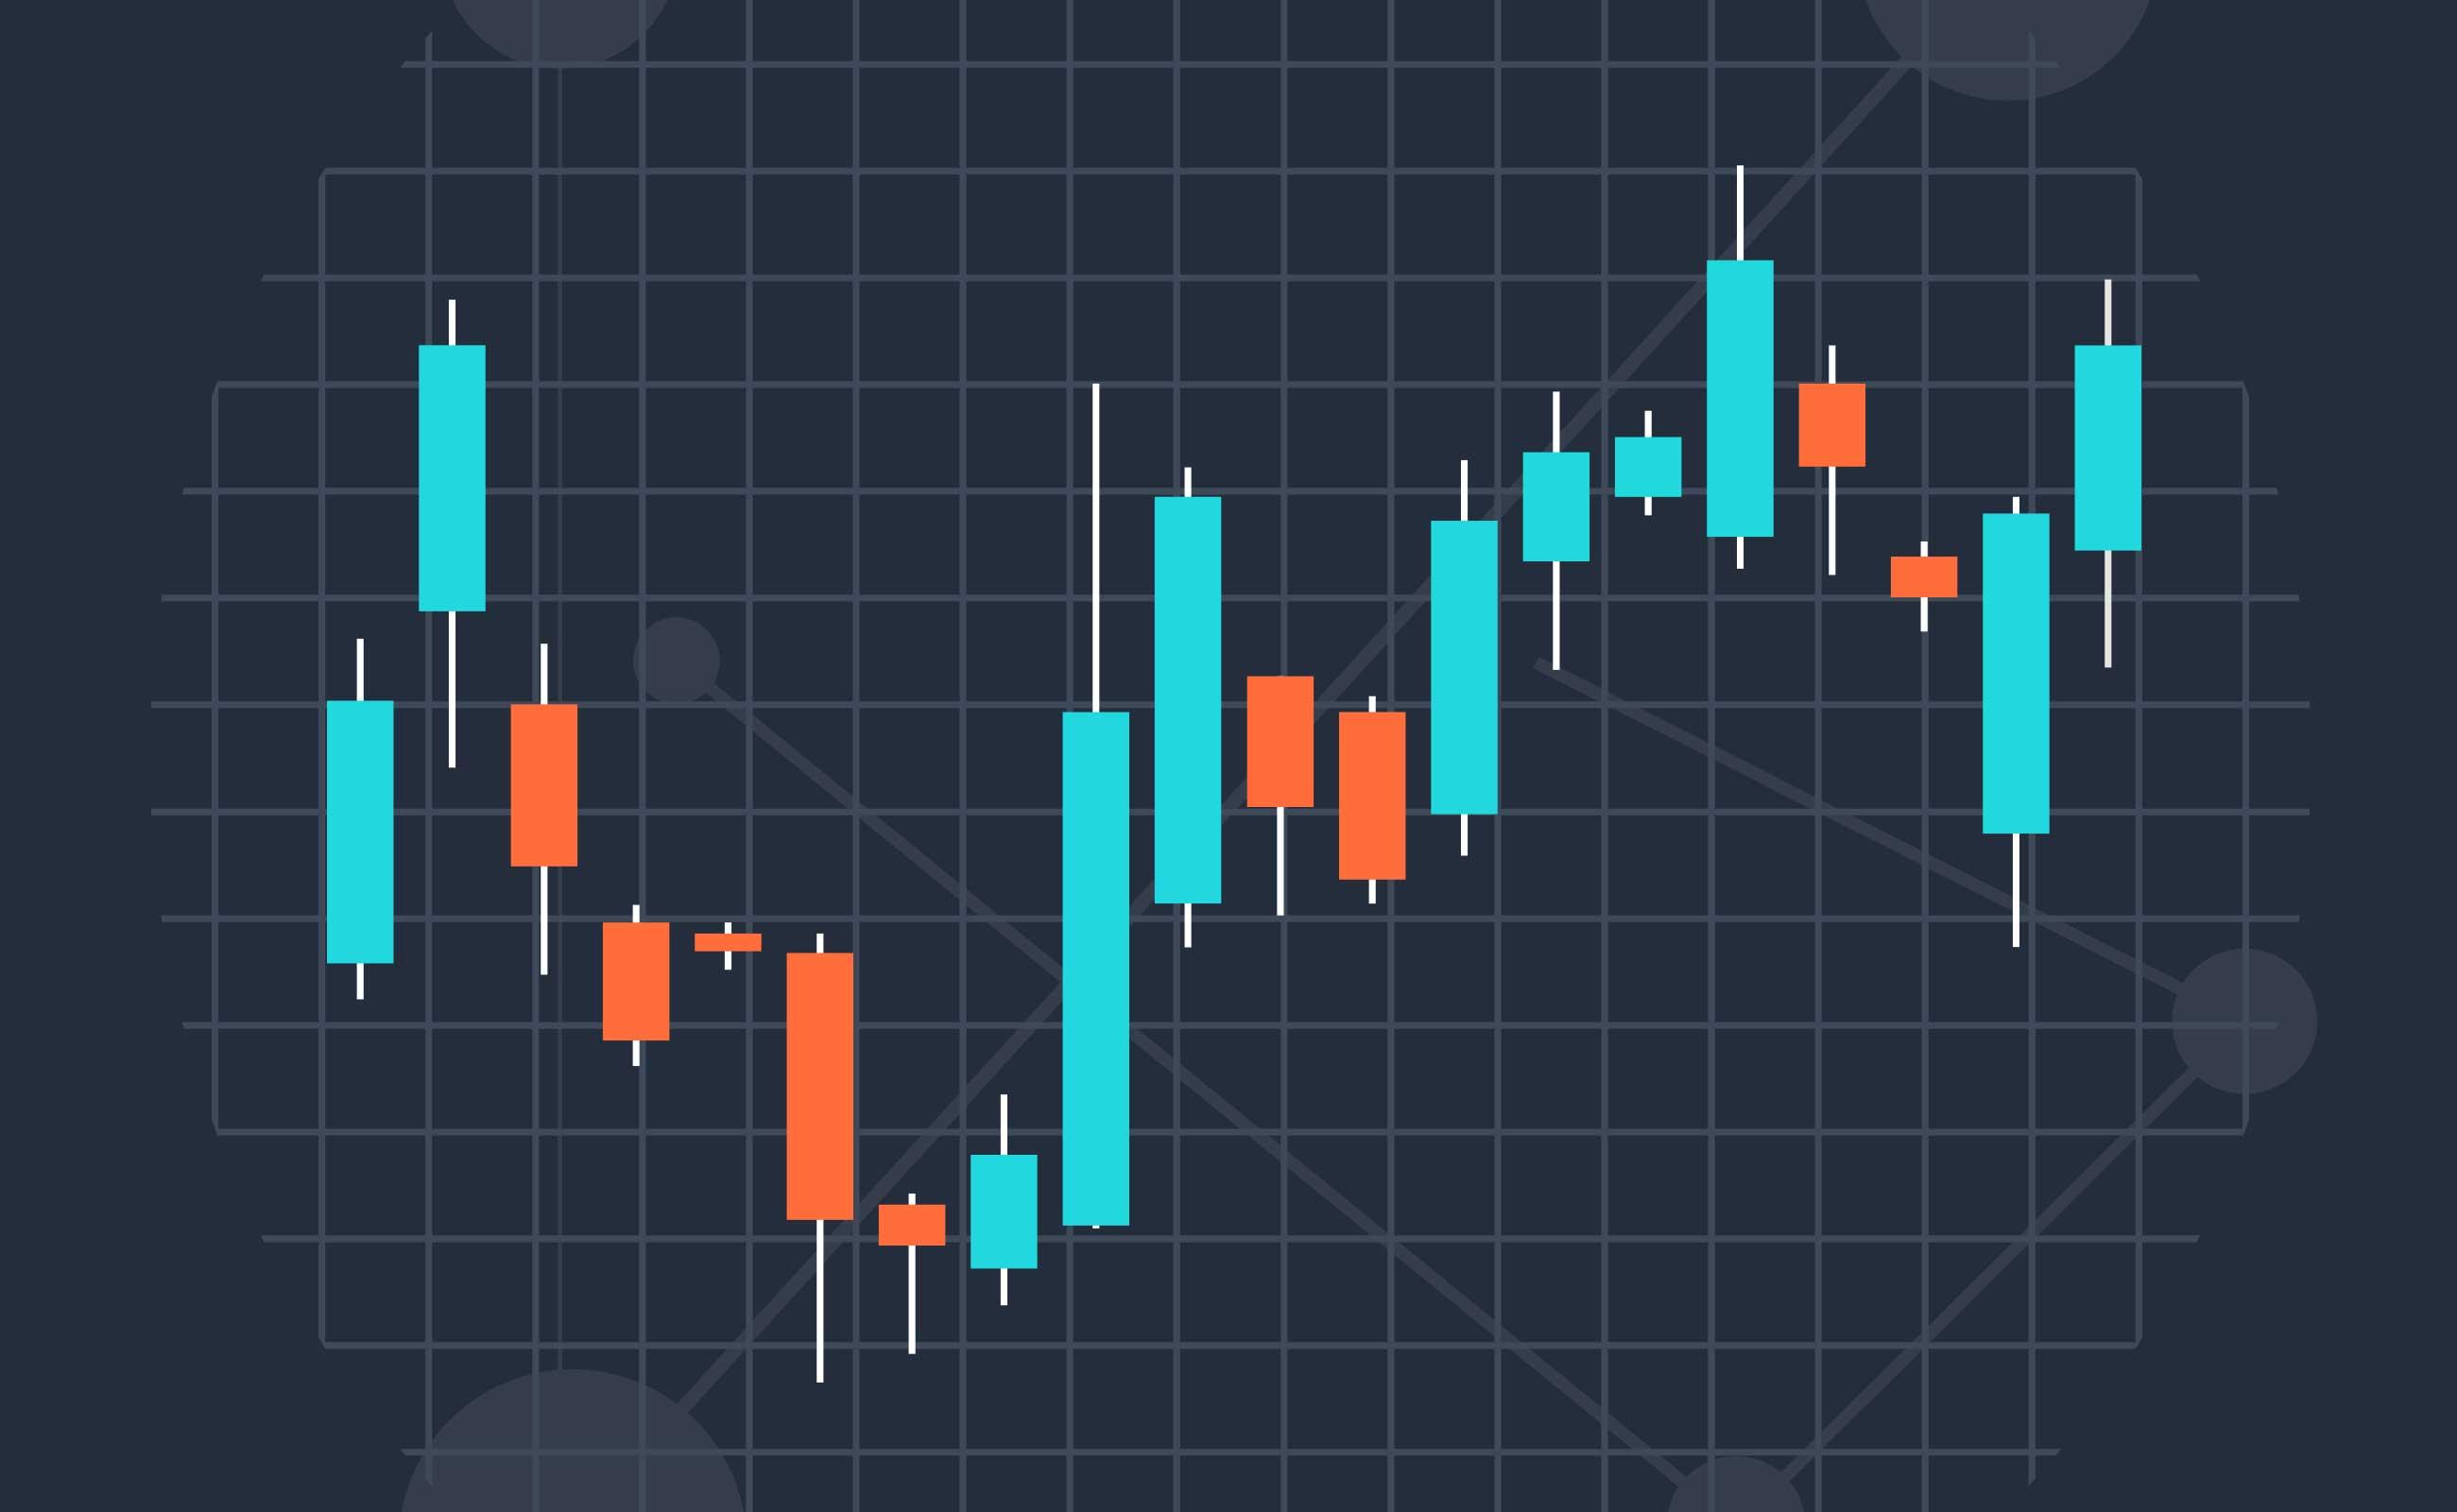 A股涨势暂歇 债市转为震荡